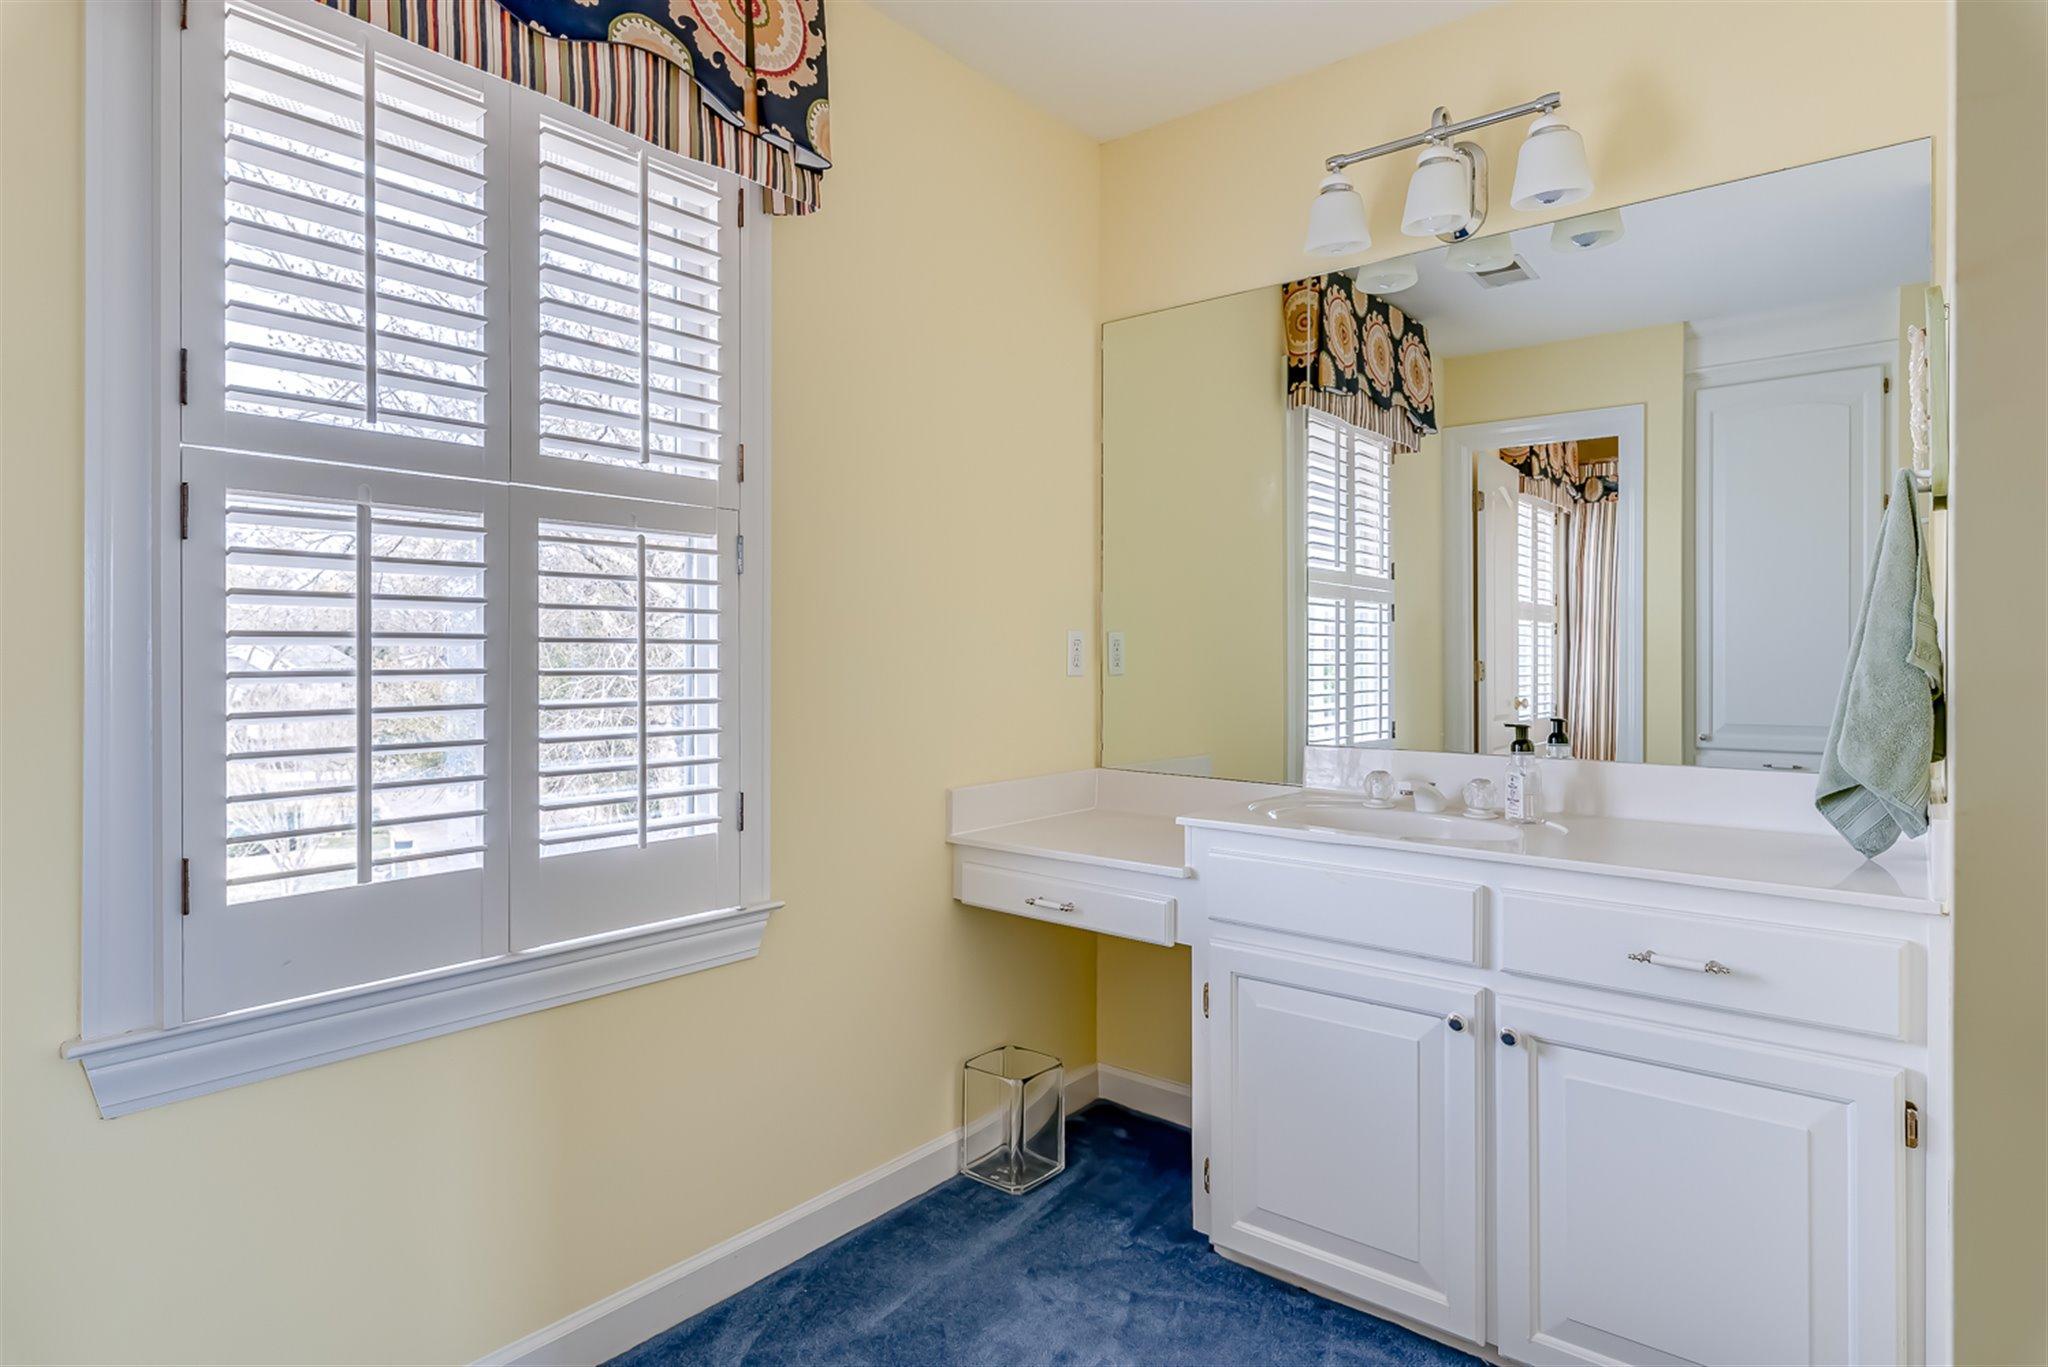 Indigo Point Homes For Sale - 50 Indigo Point, Charleston, SC - 13